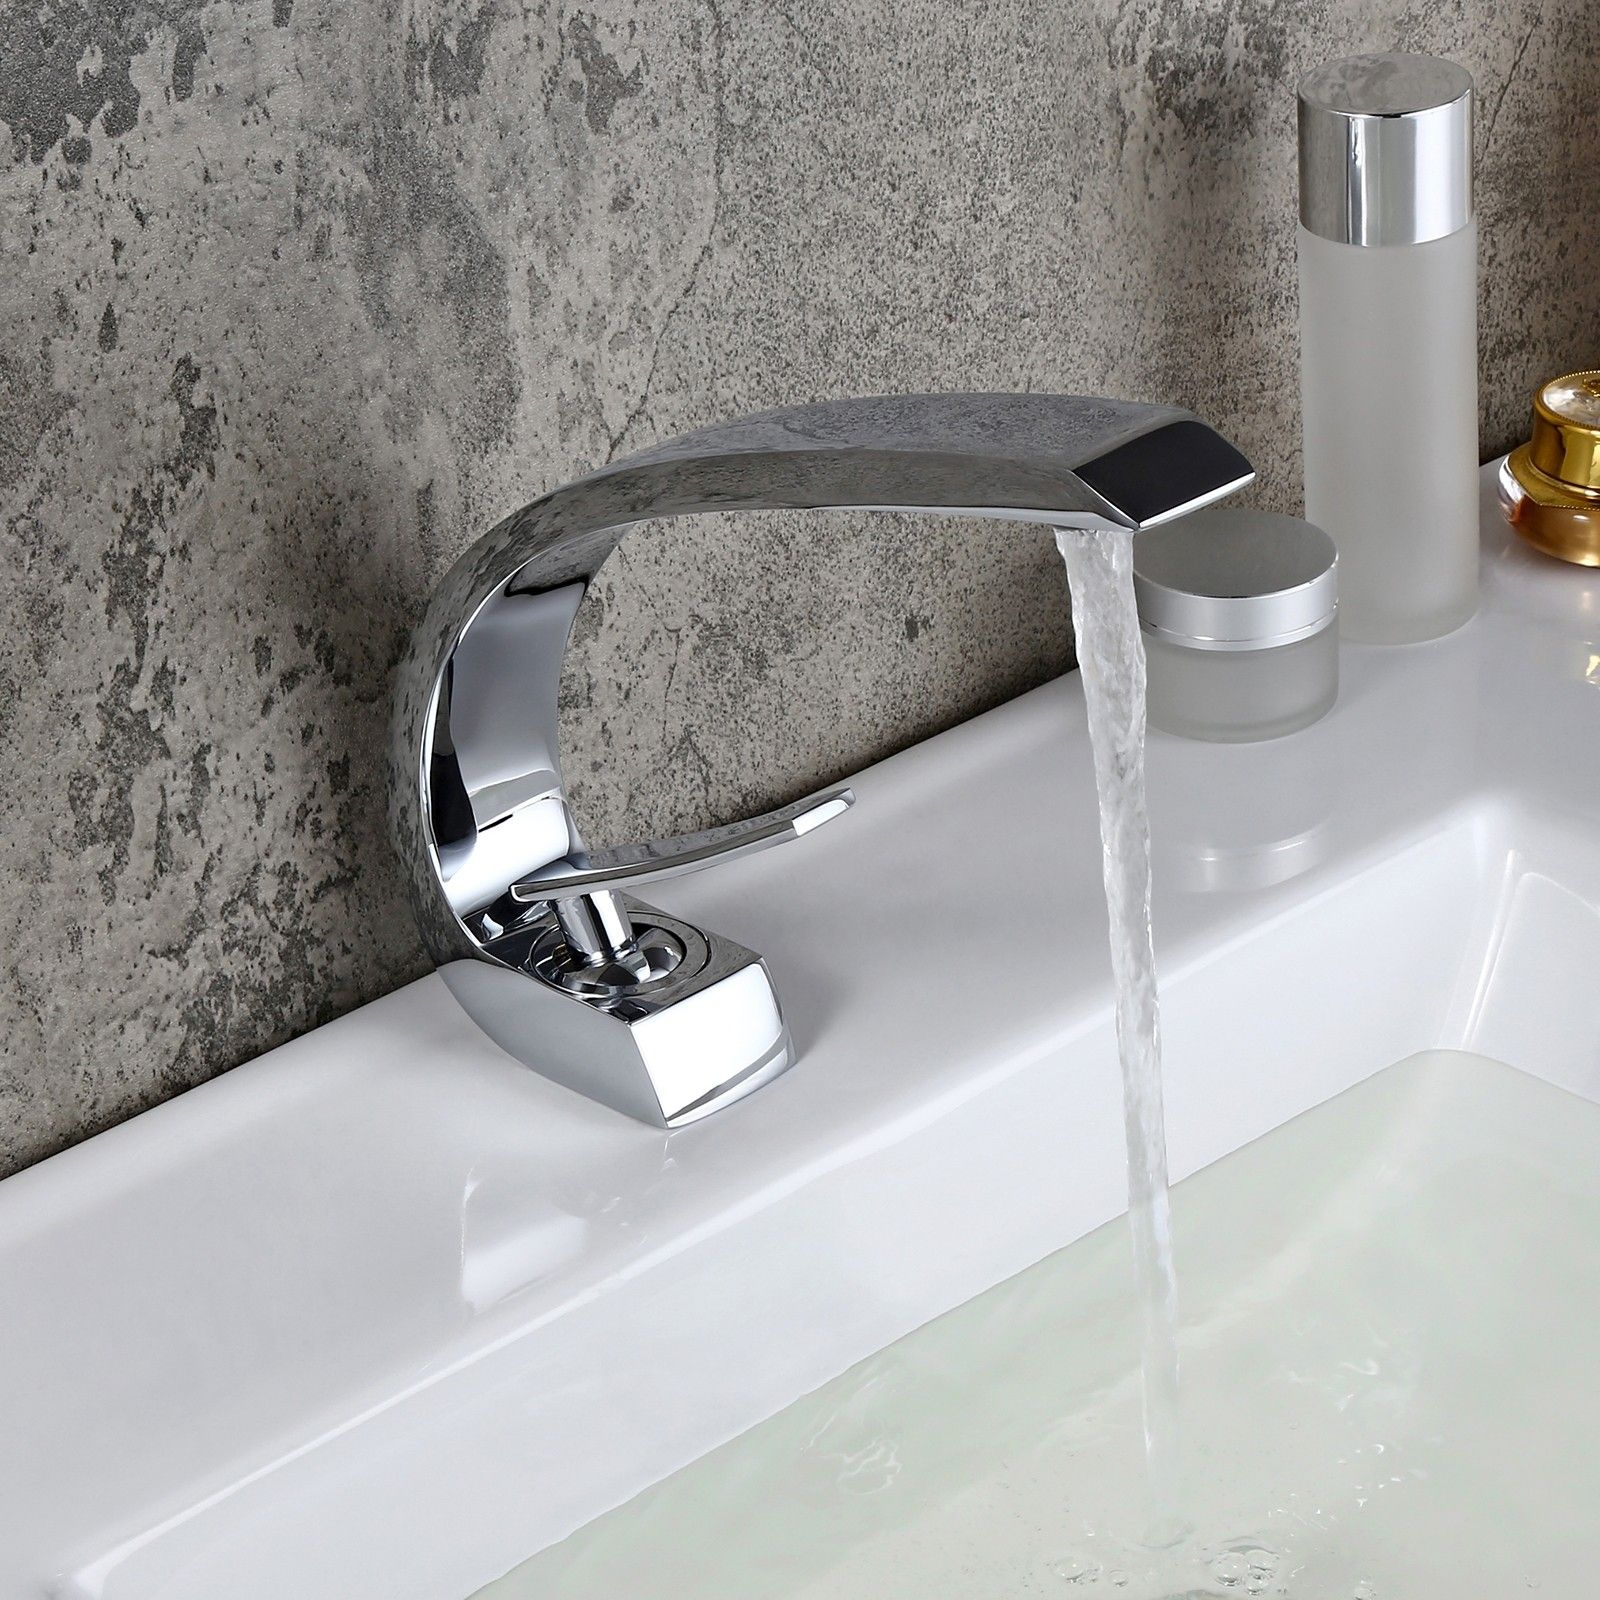 Modern Single Hole 6-Handle C-Shaped Curved Spout Bathroom Sink